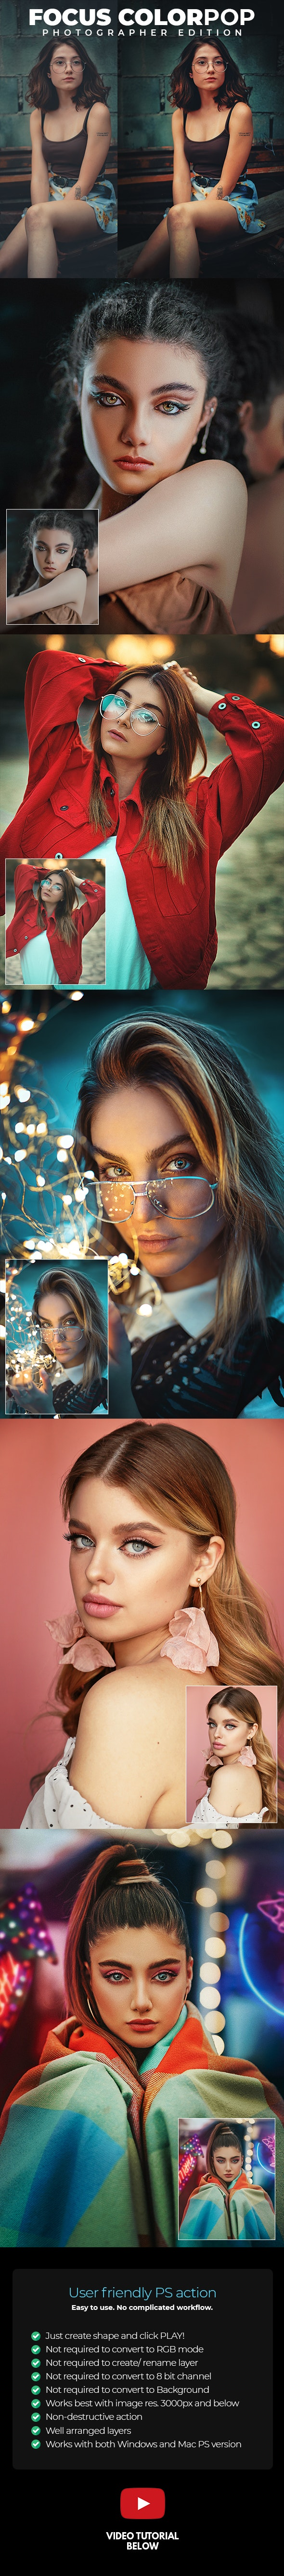 Focus Colorpop - Photoshop Action - Photo Effects Actions